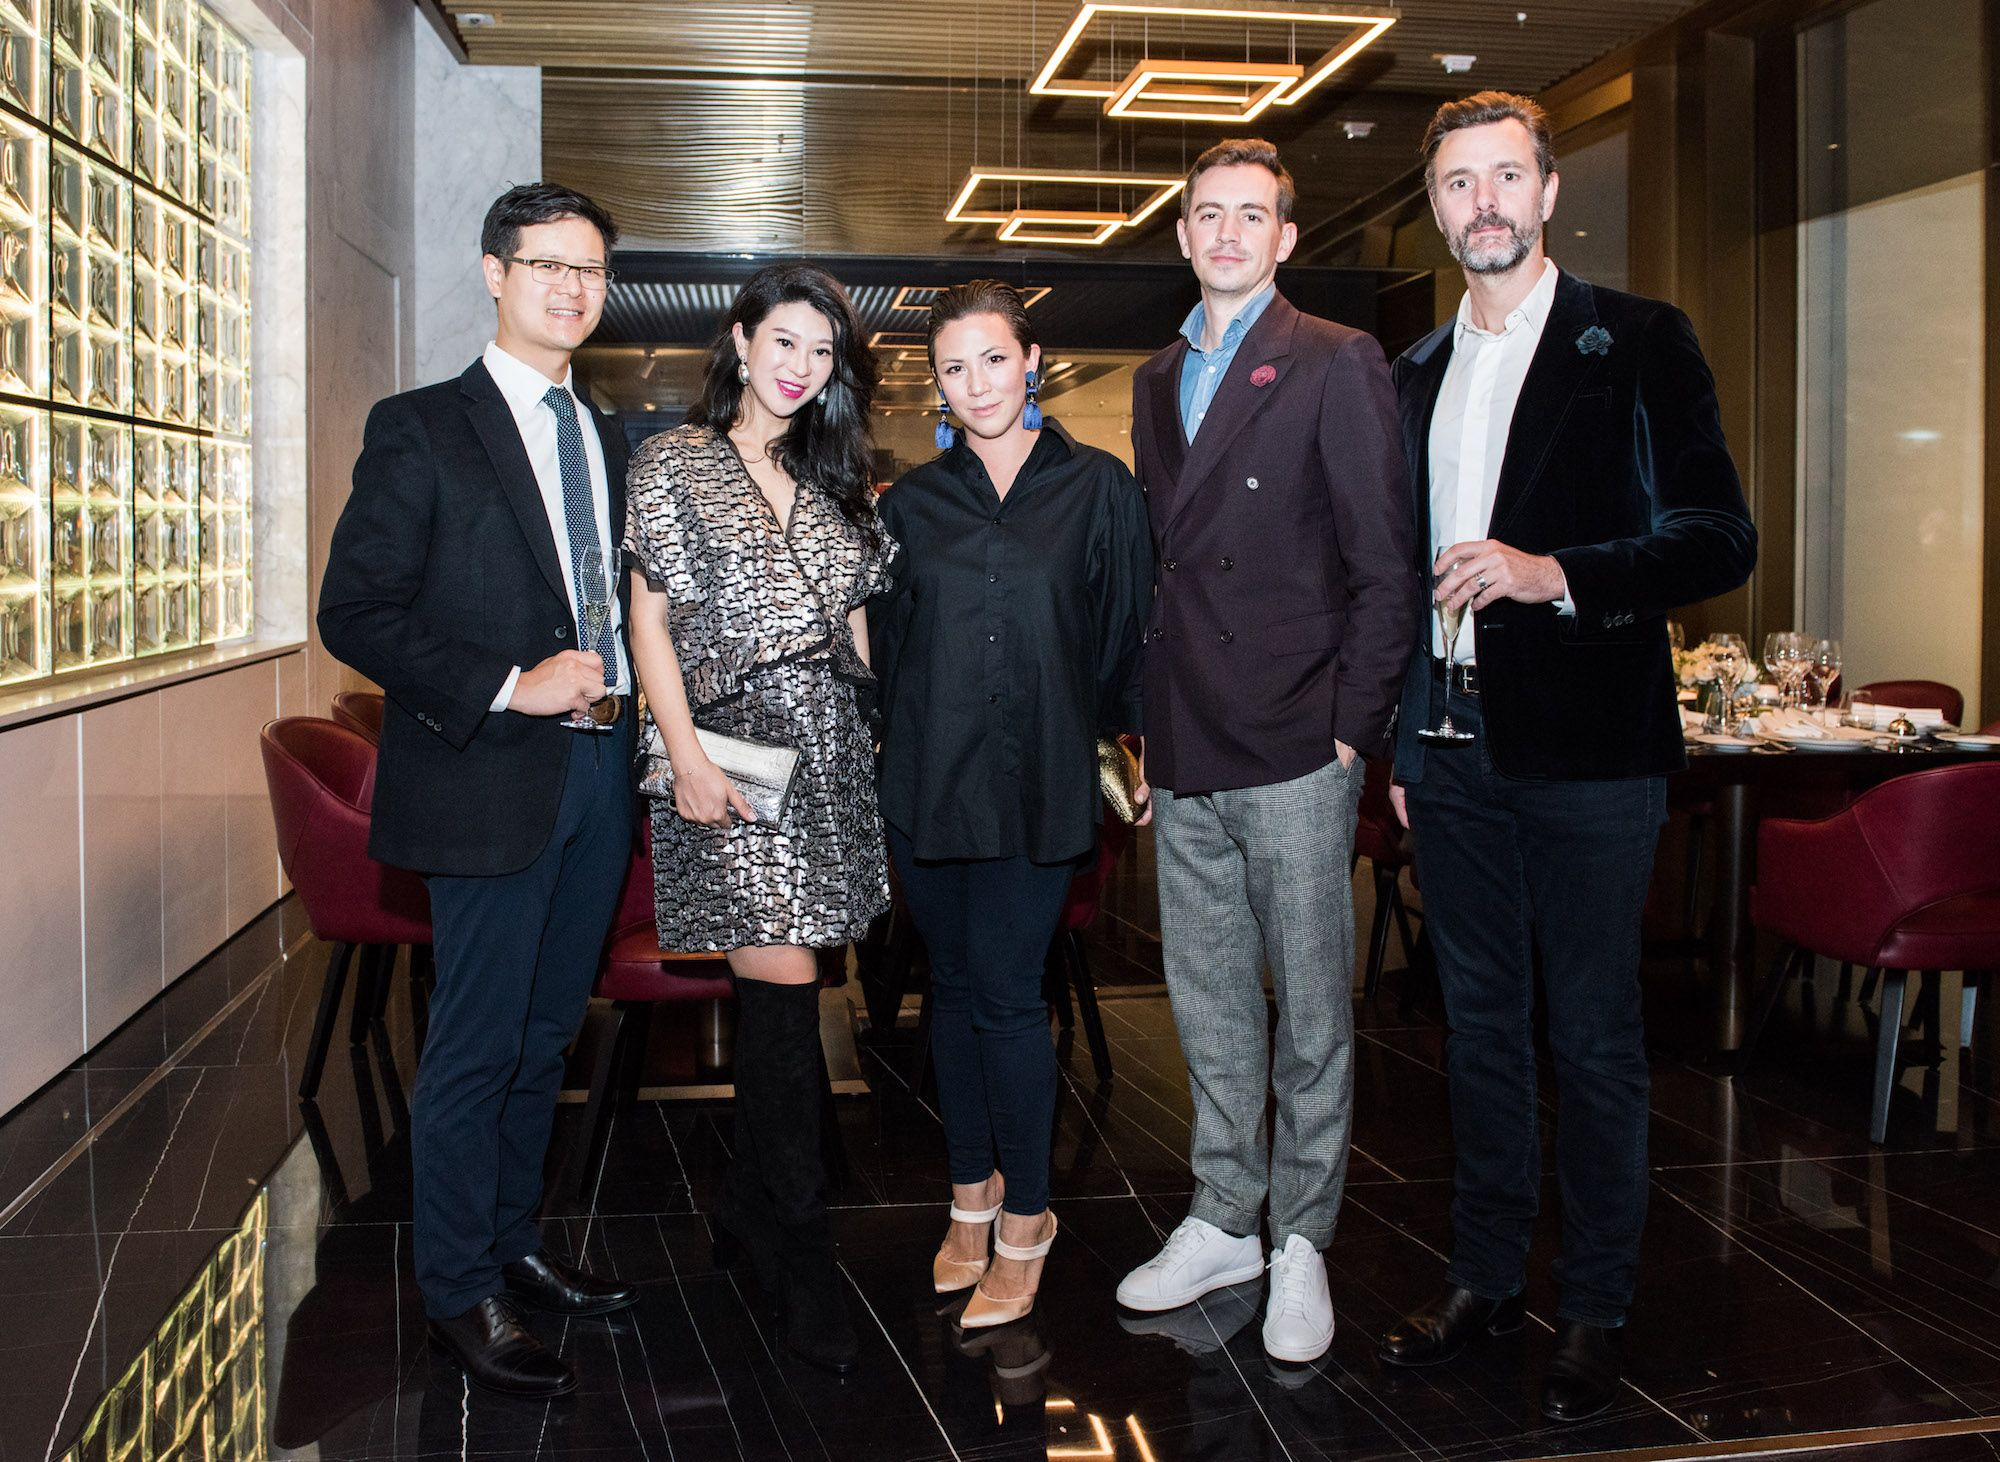 Benjamin Liang, Christy Liang, Victoria Tang-Owen, Christopher Owen, Arnaud Poix